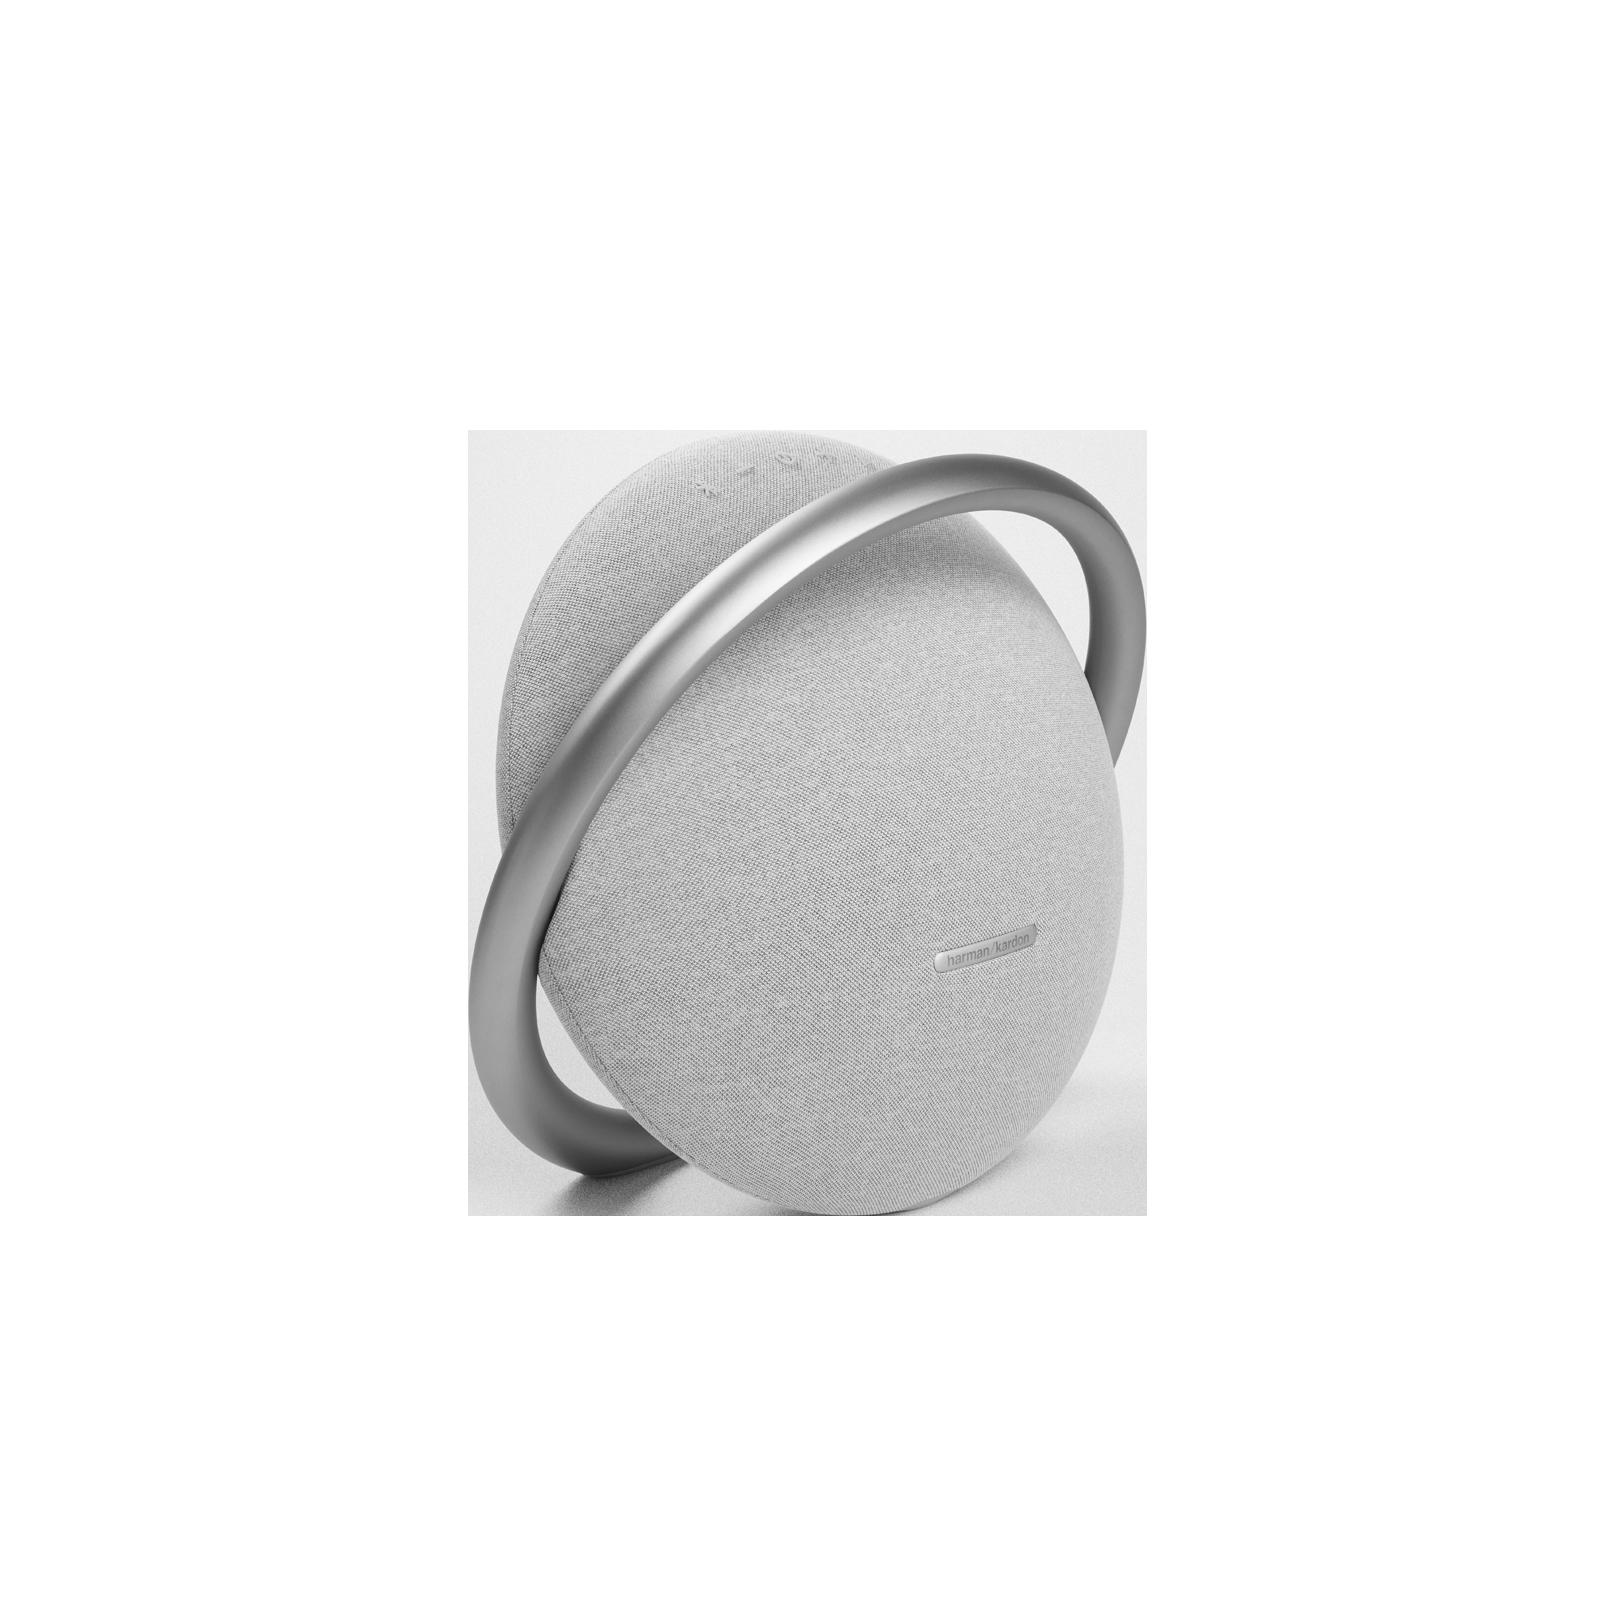 Onyx Studio 7 - Grey - Portable Stereo Bluetooth Speaker - Detailshot 1